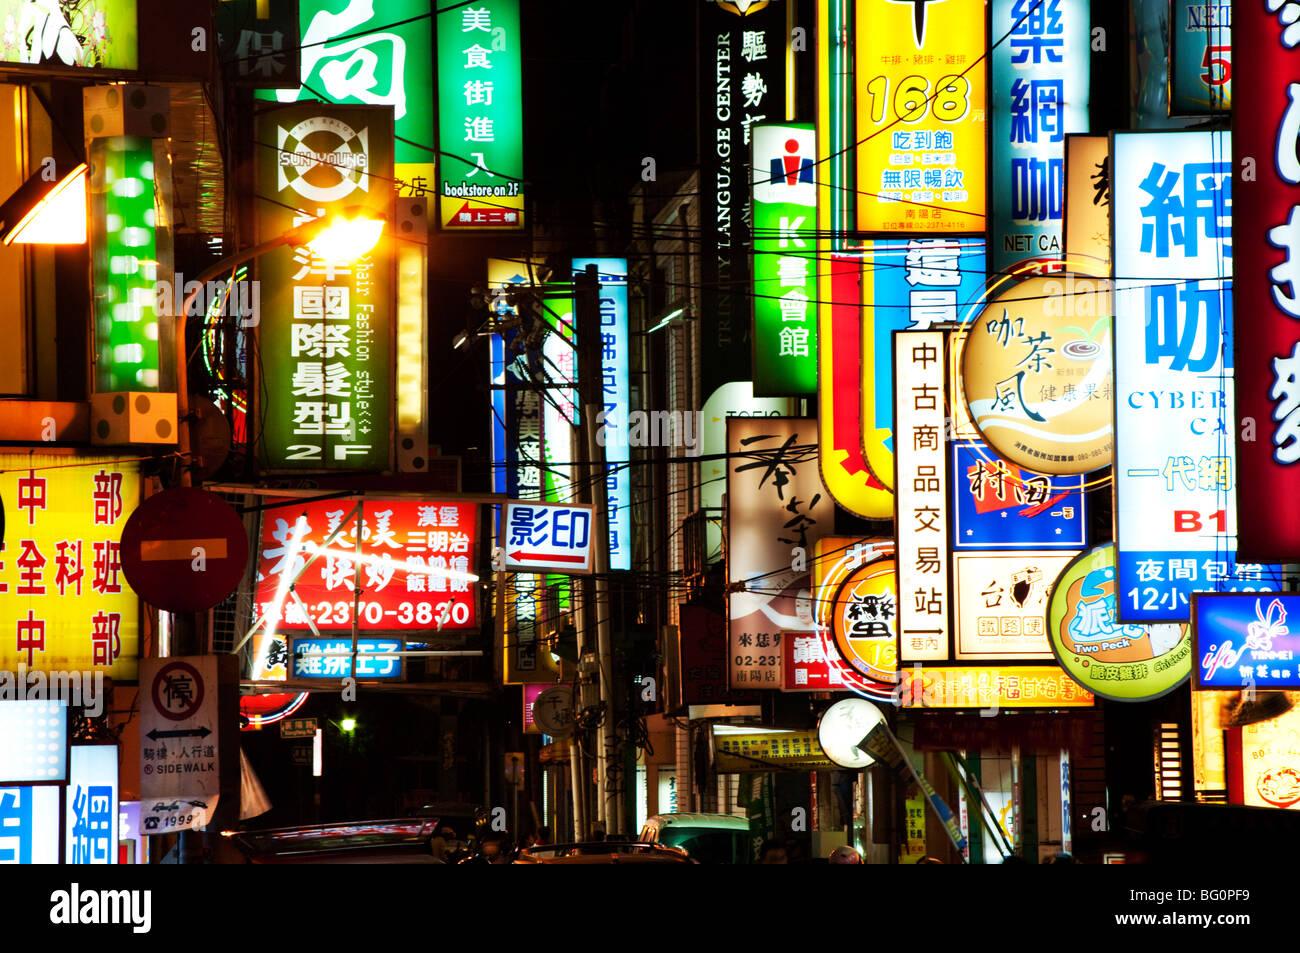 Enseignes lumineuses la nuit, Taipei, Taïwan, l'Asie Photo Stock